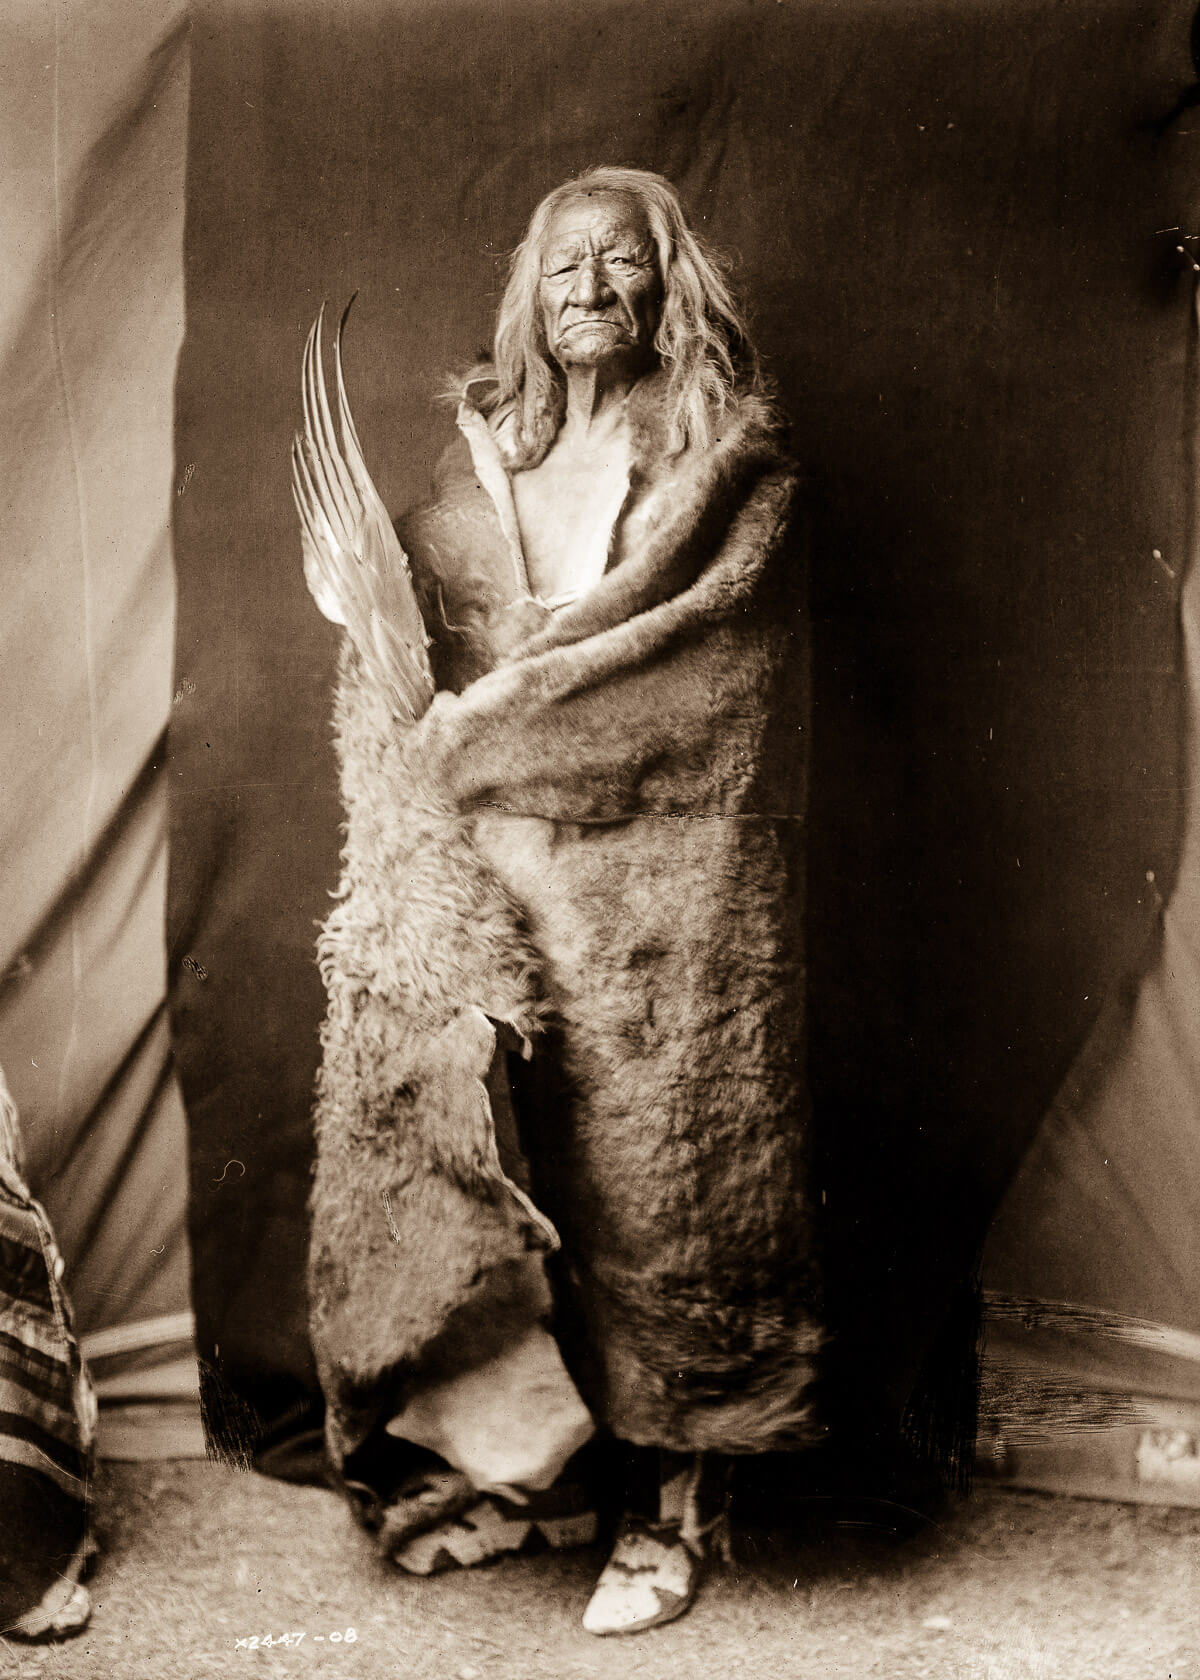 NativeAmerican-fotografia-oldskull-22